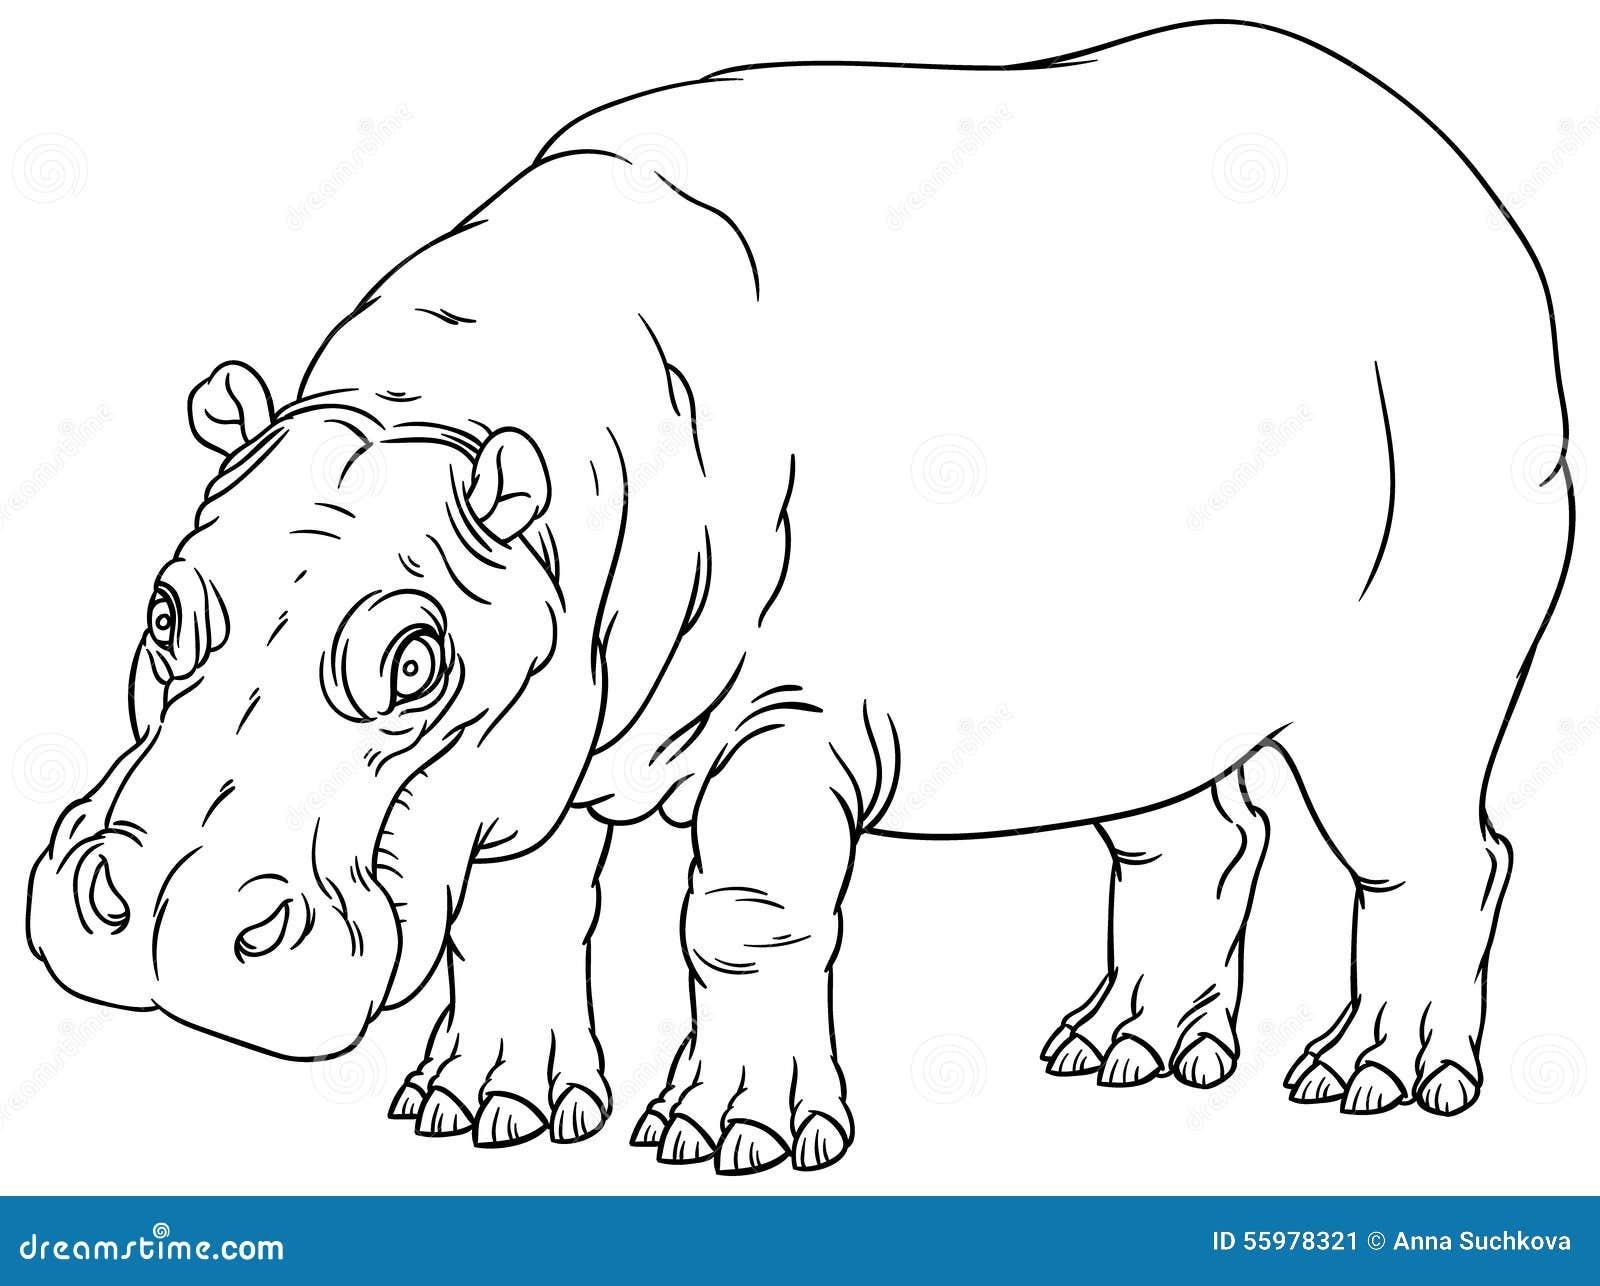 Line Art Hippo : Hippopotamus amphibius or river horse stock vector image